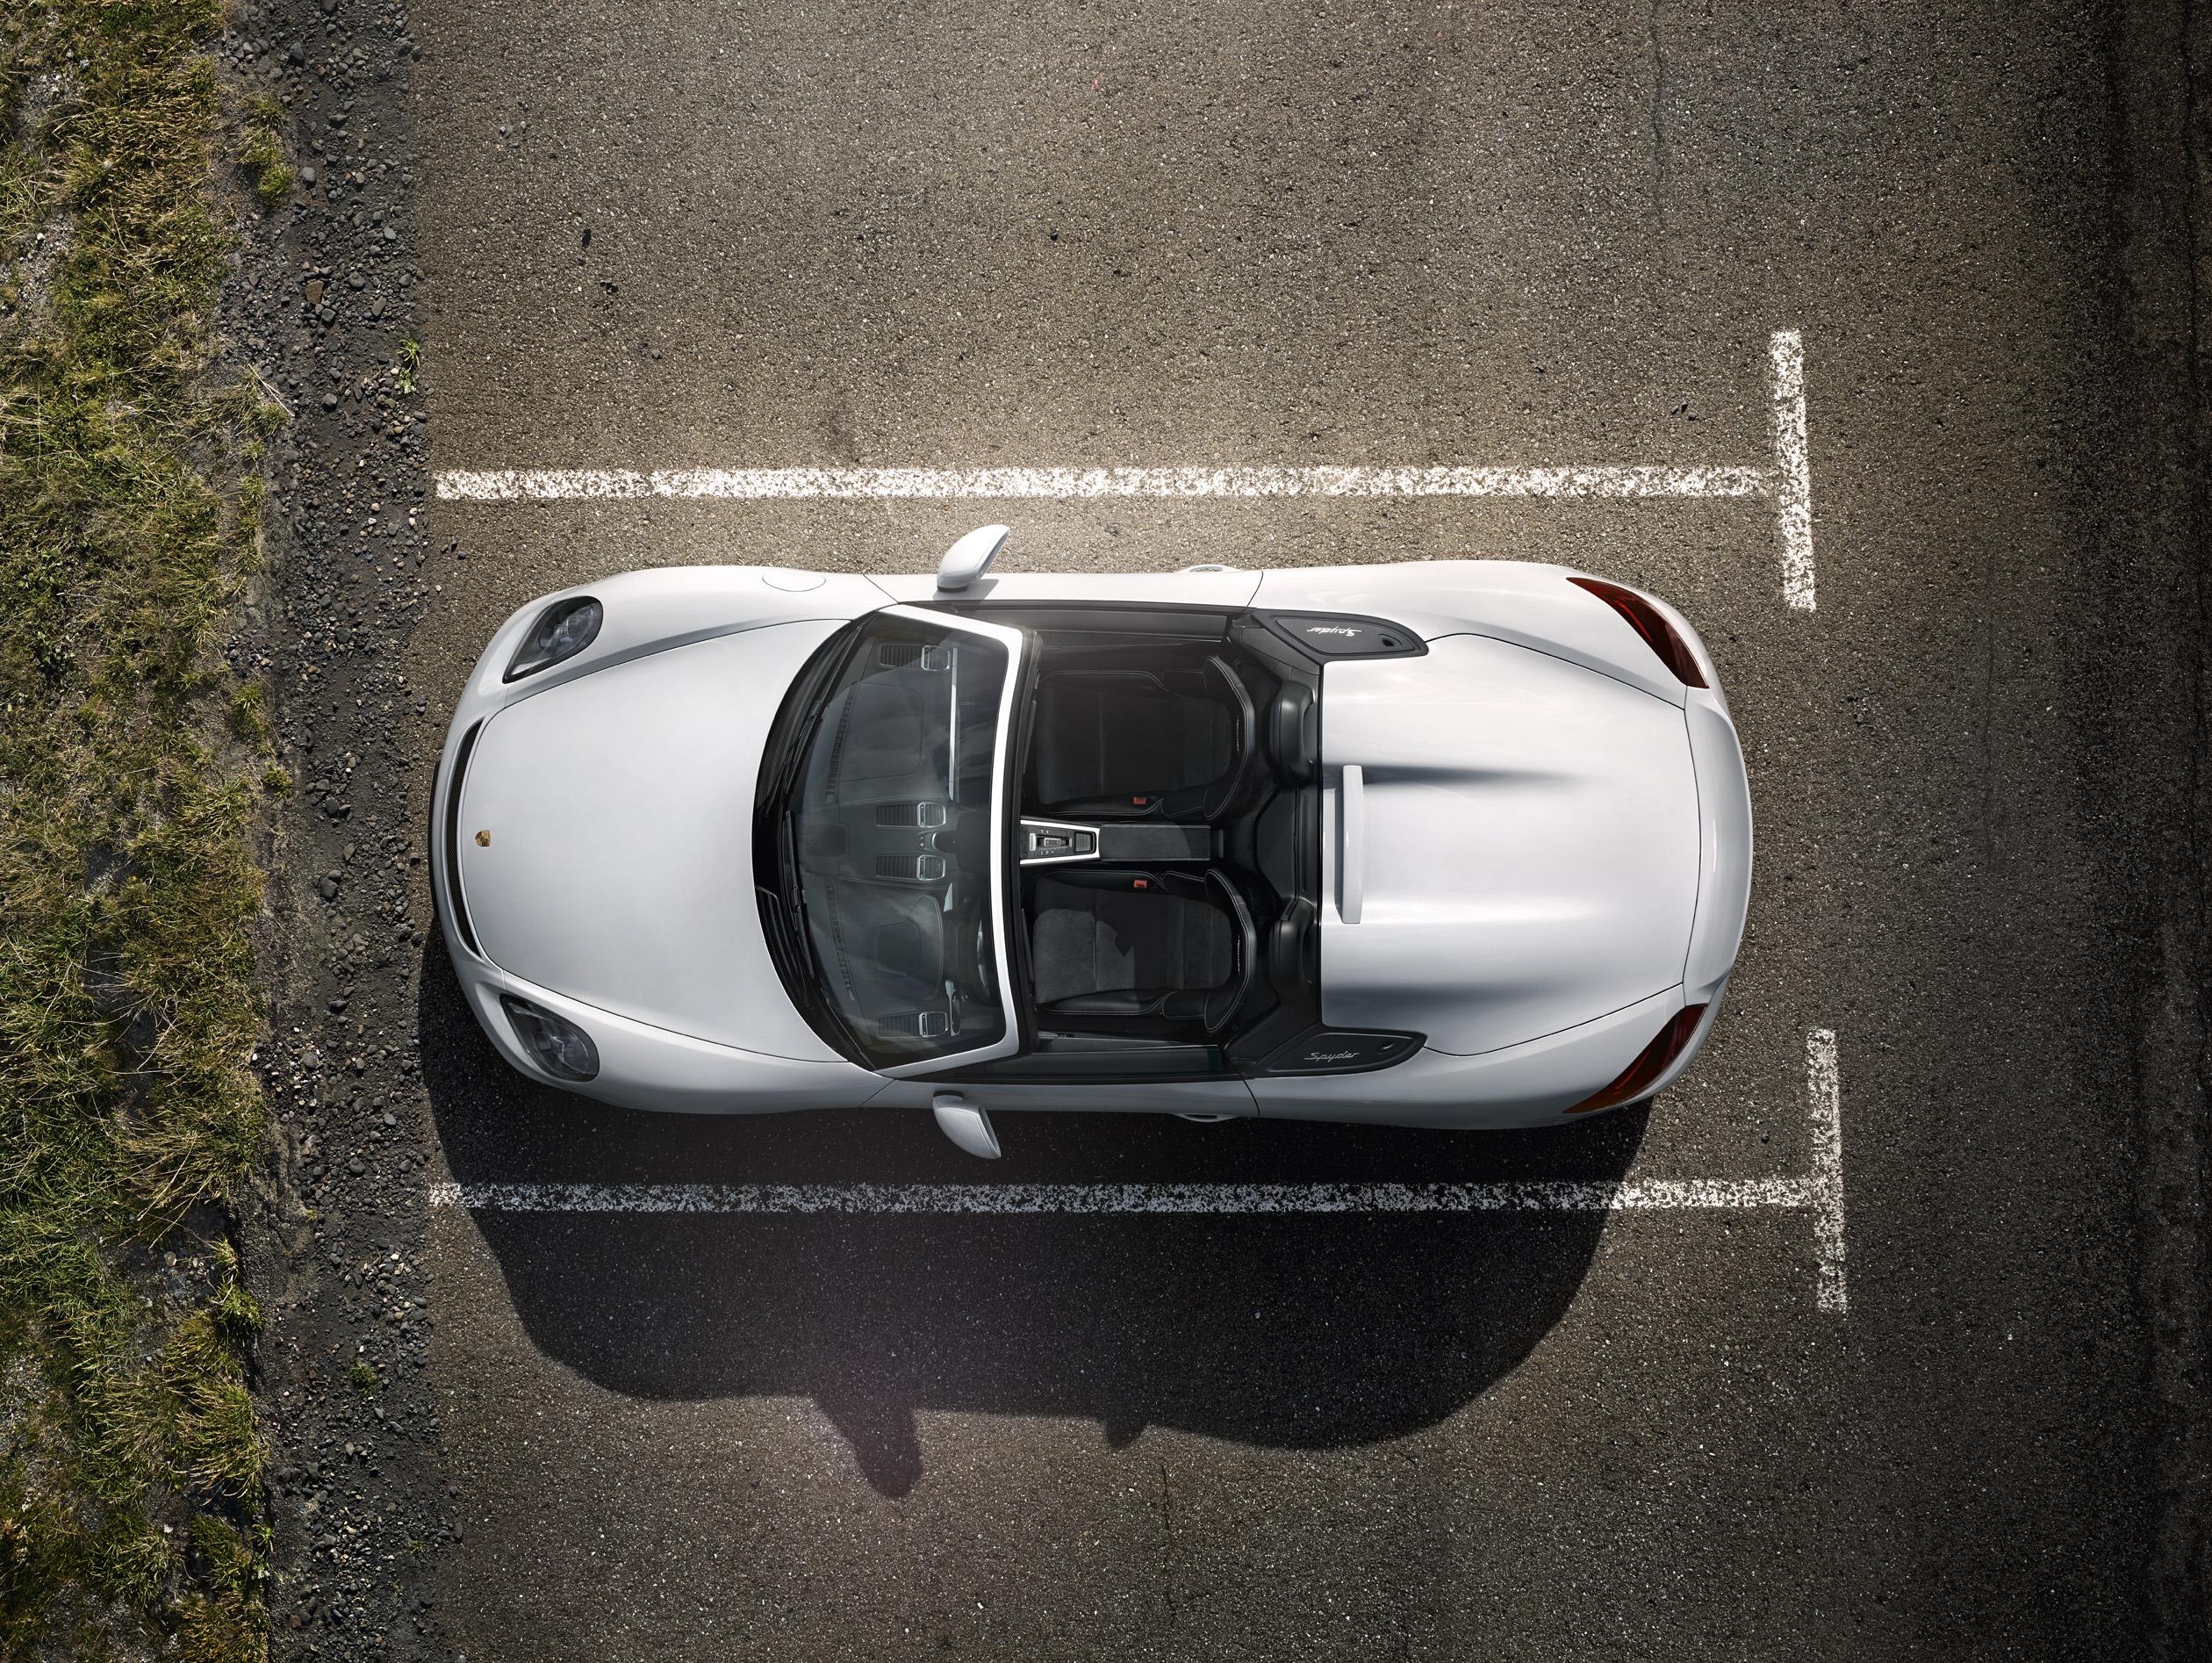 Porsche 2016 Boxster Spyder - vue du toit / top - open